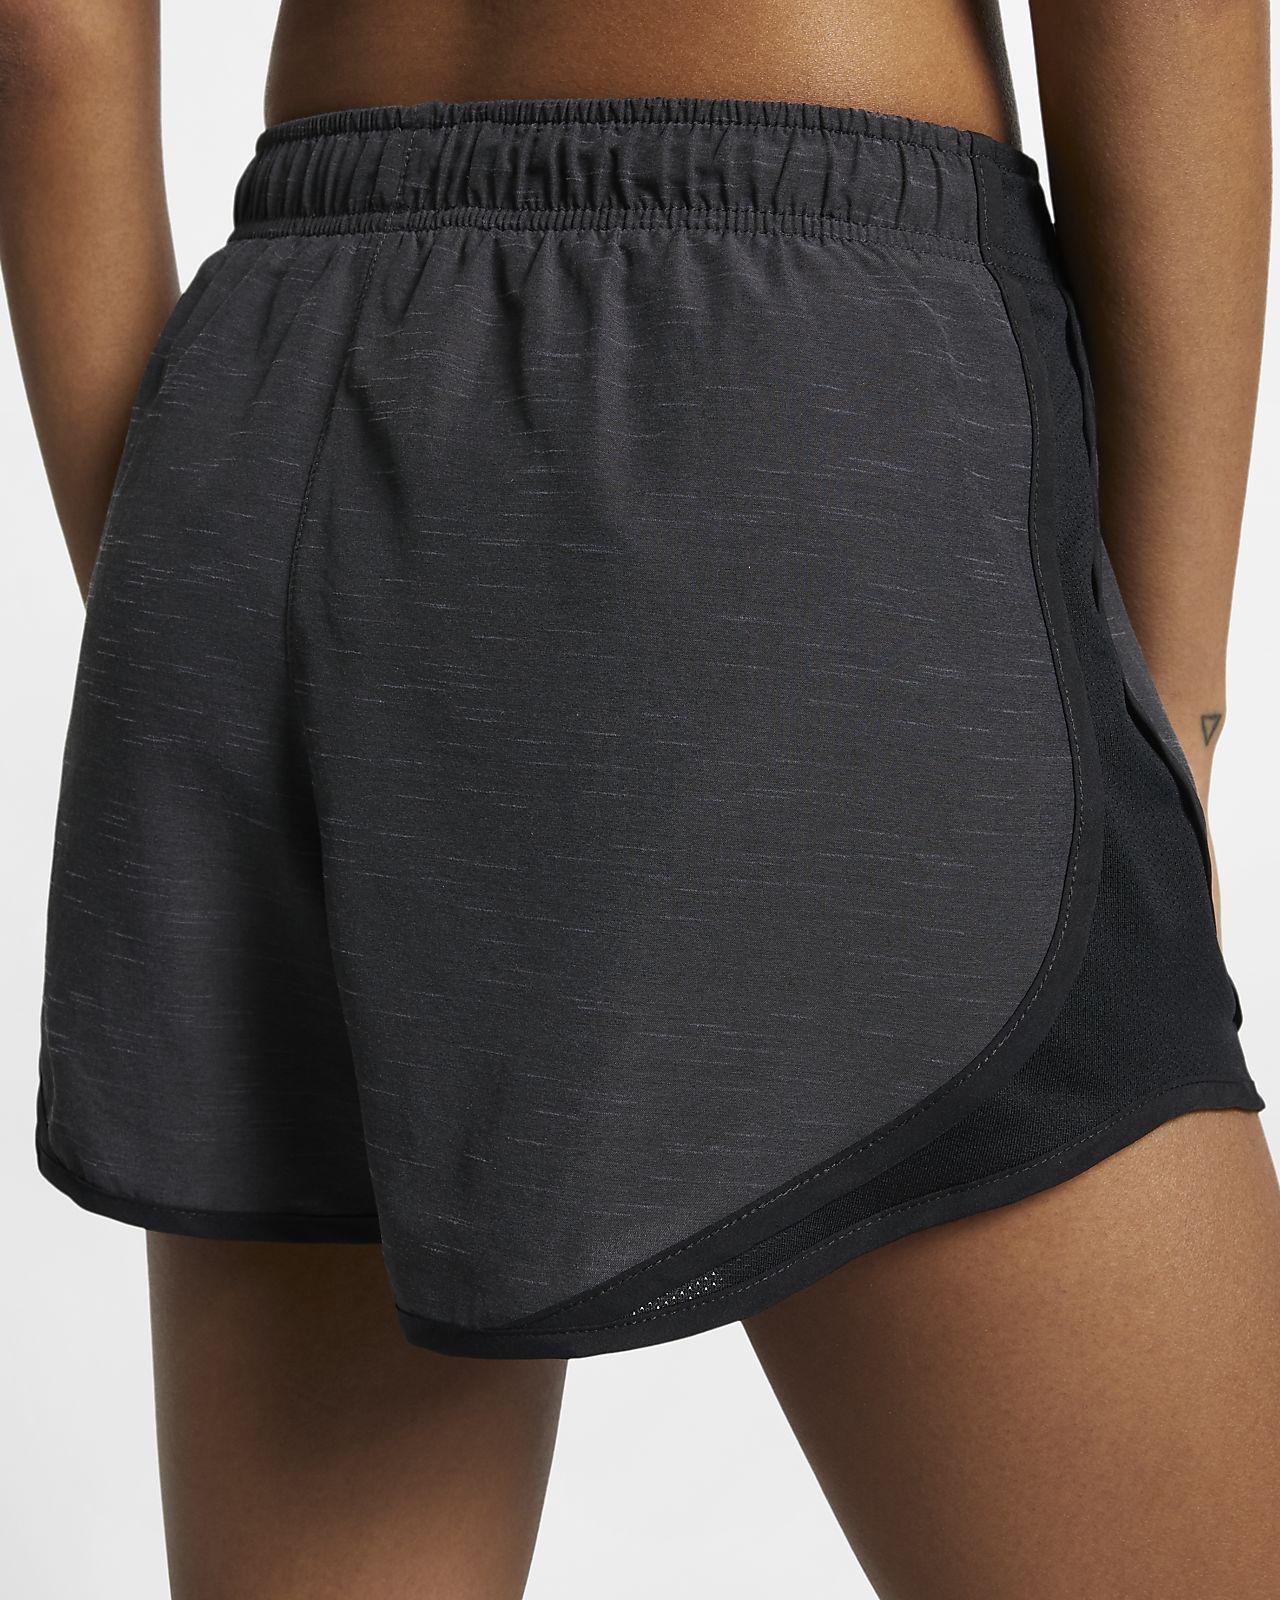 0a0e97a02 Low Resolution Nike Tempo Women's Running Shorts Nike Tempo Women's Running  Shorts